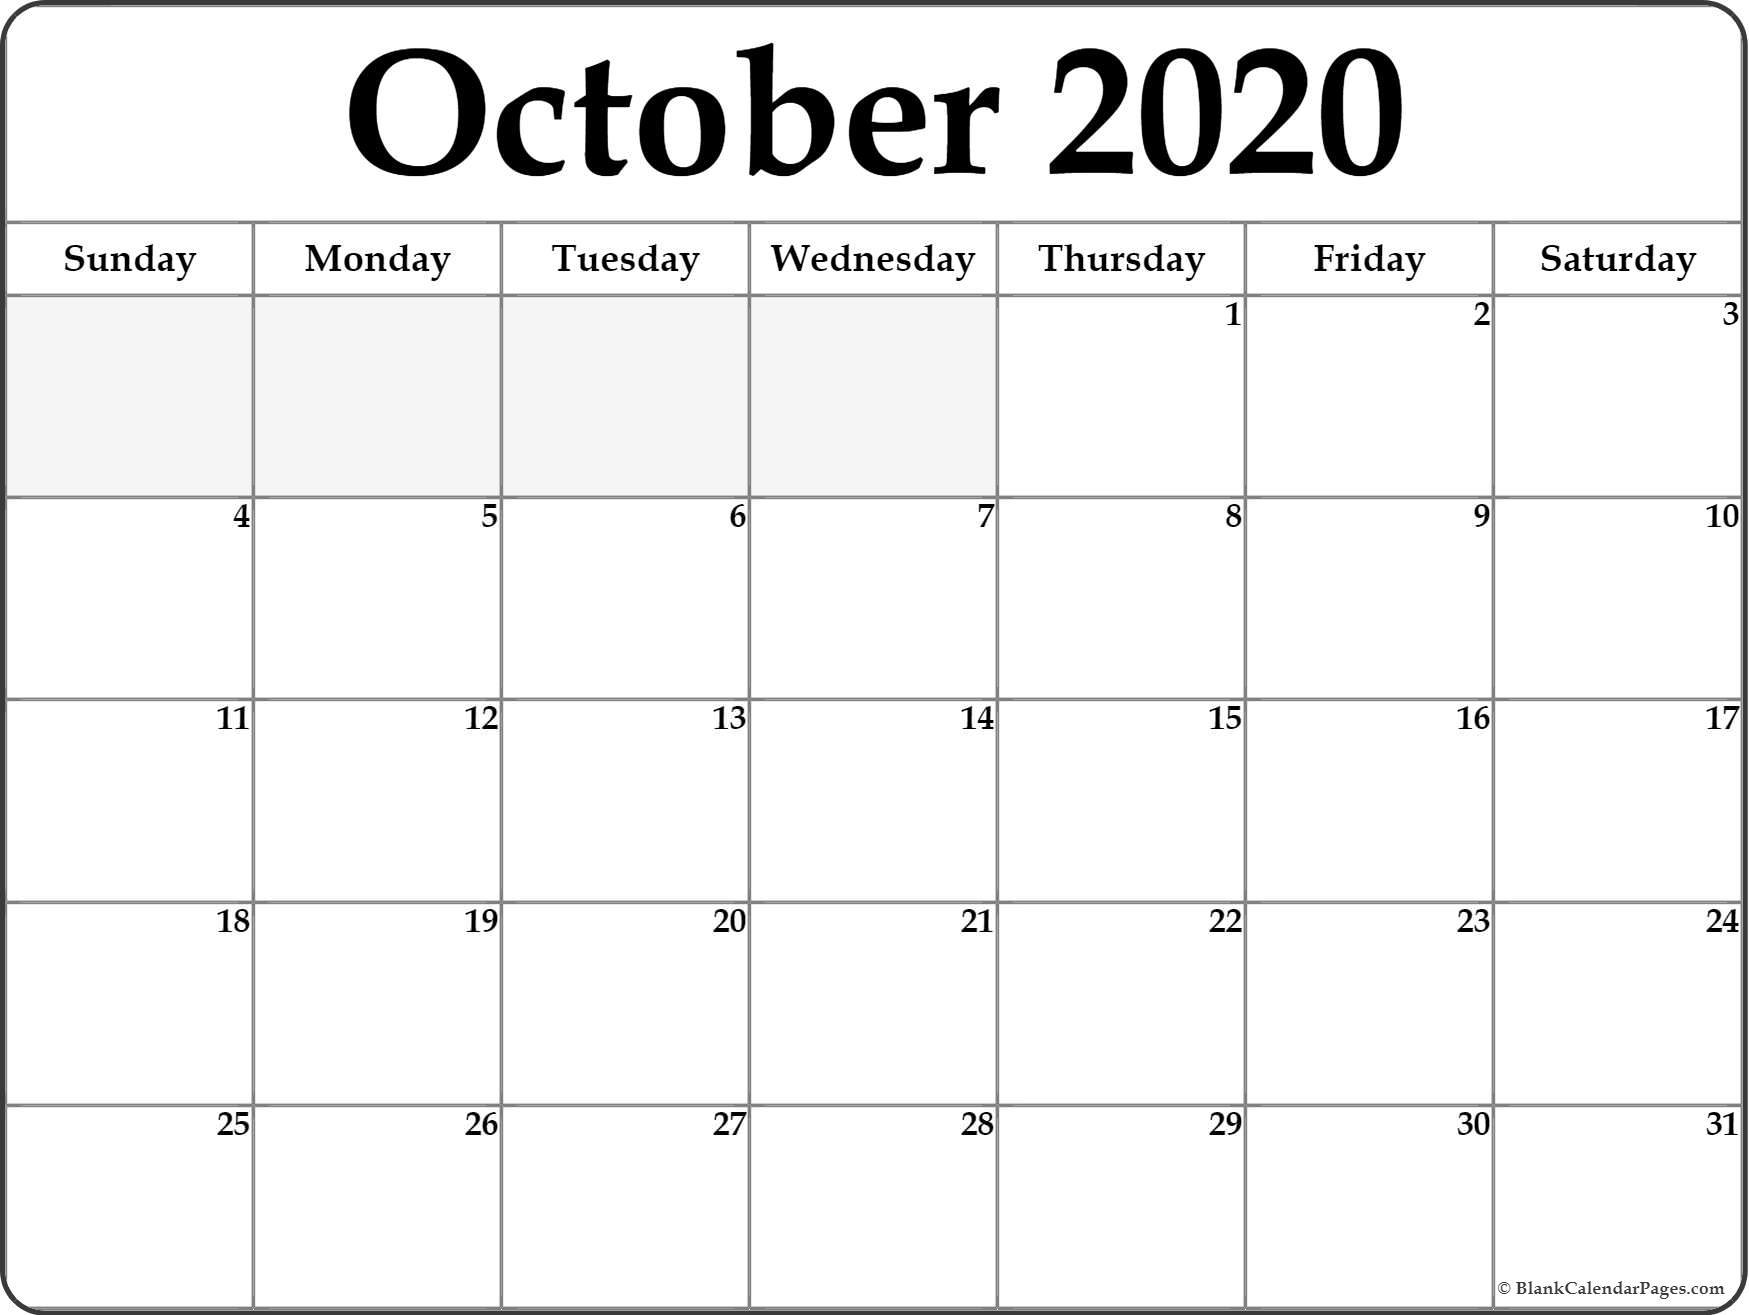 October 2020 Blank Calendar Templates.